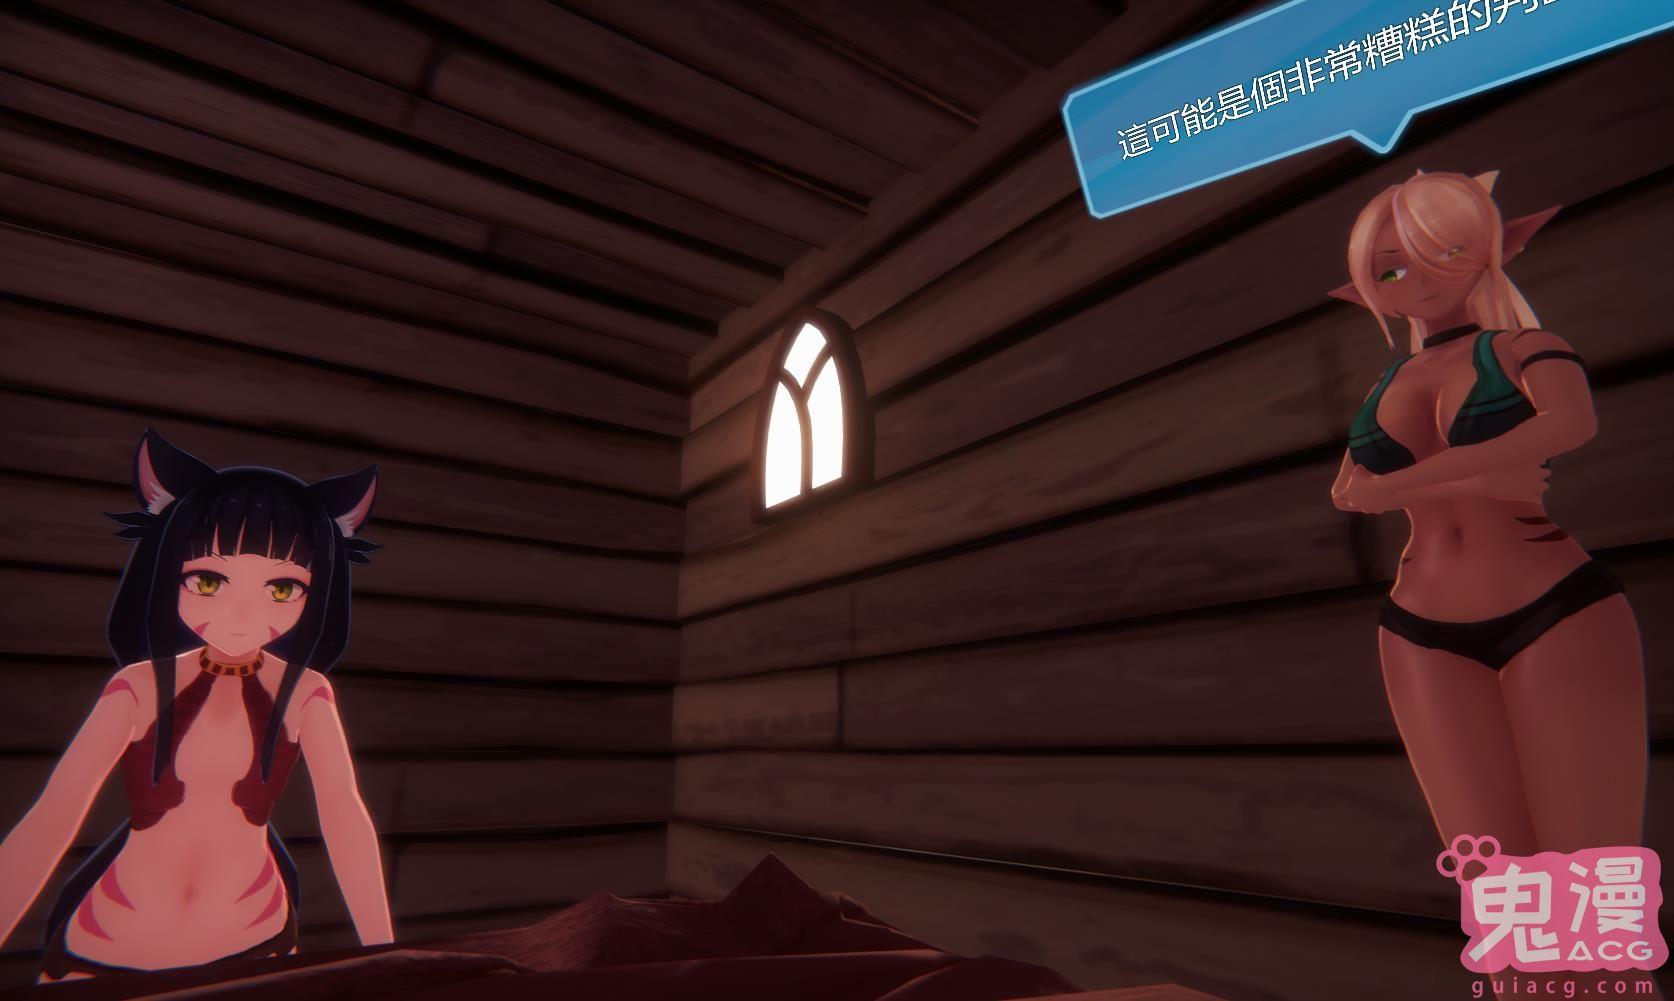 【3D互动/汉化/动态】魔物娘岛屿 Monster Girl Island V0.3汉化版 全CV【5G/百度】 投稿专区 第3张